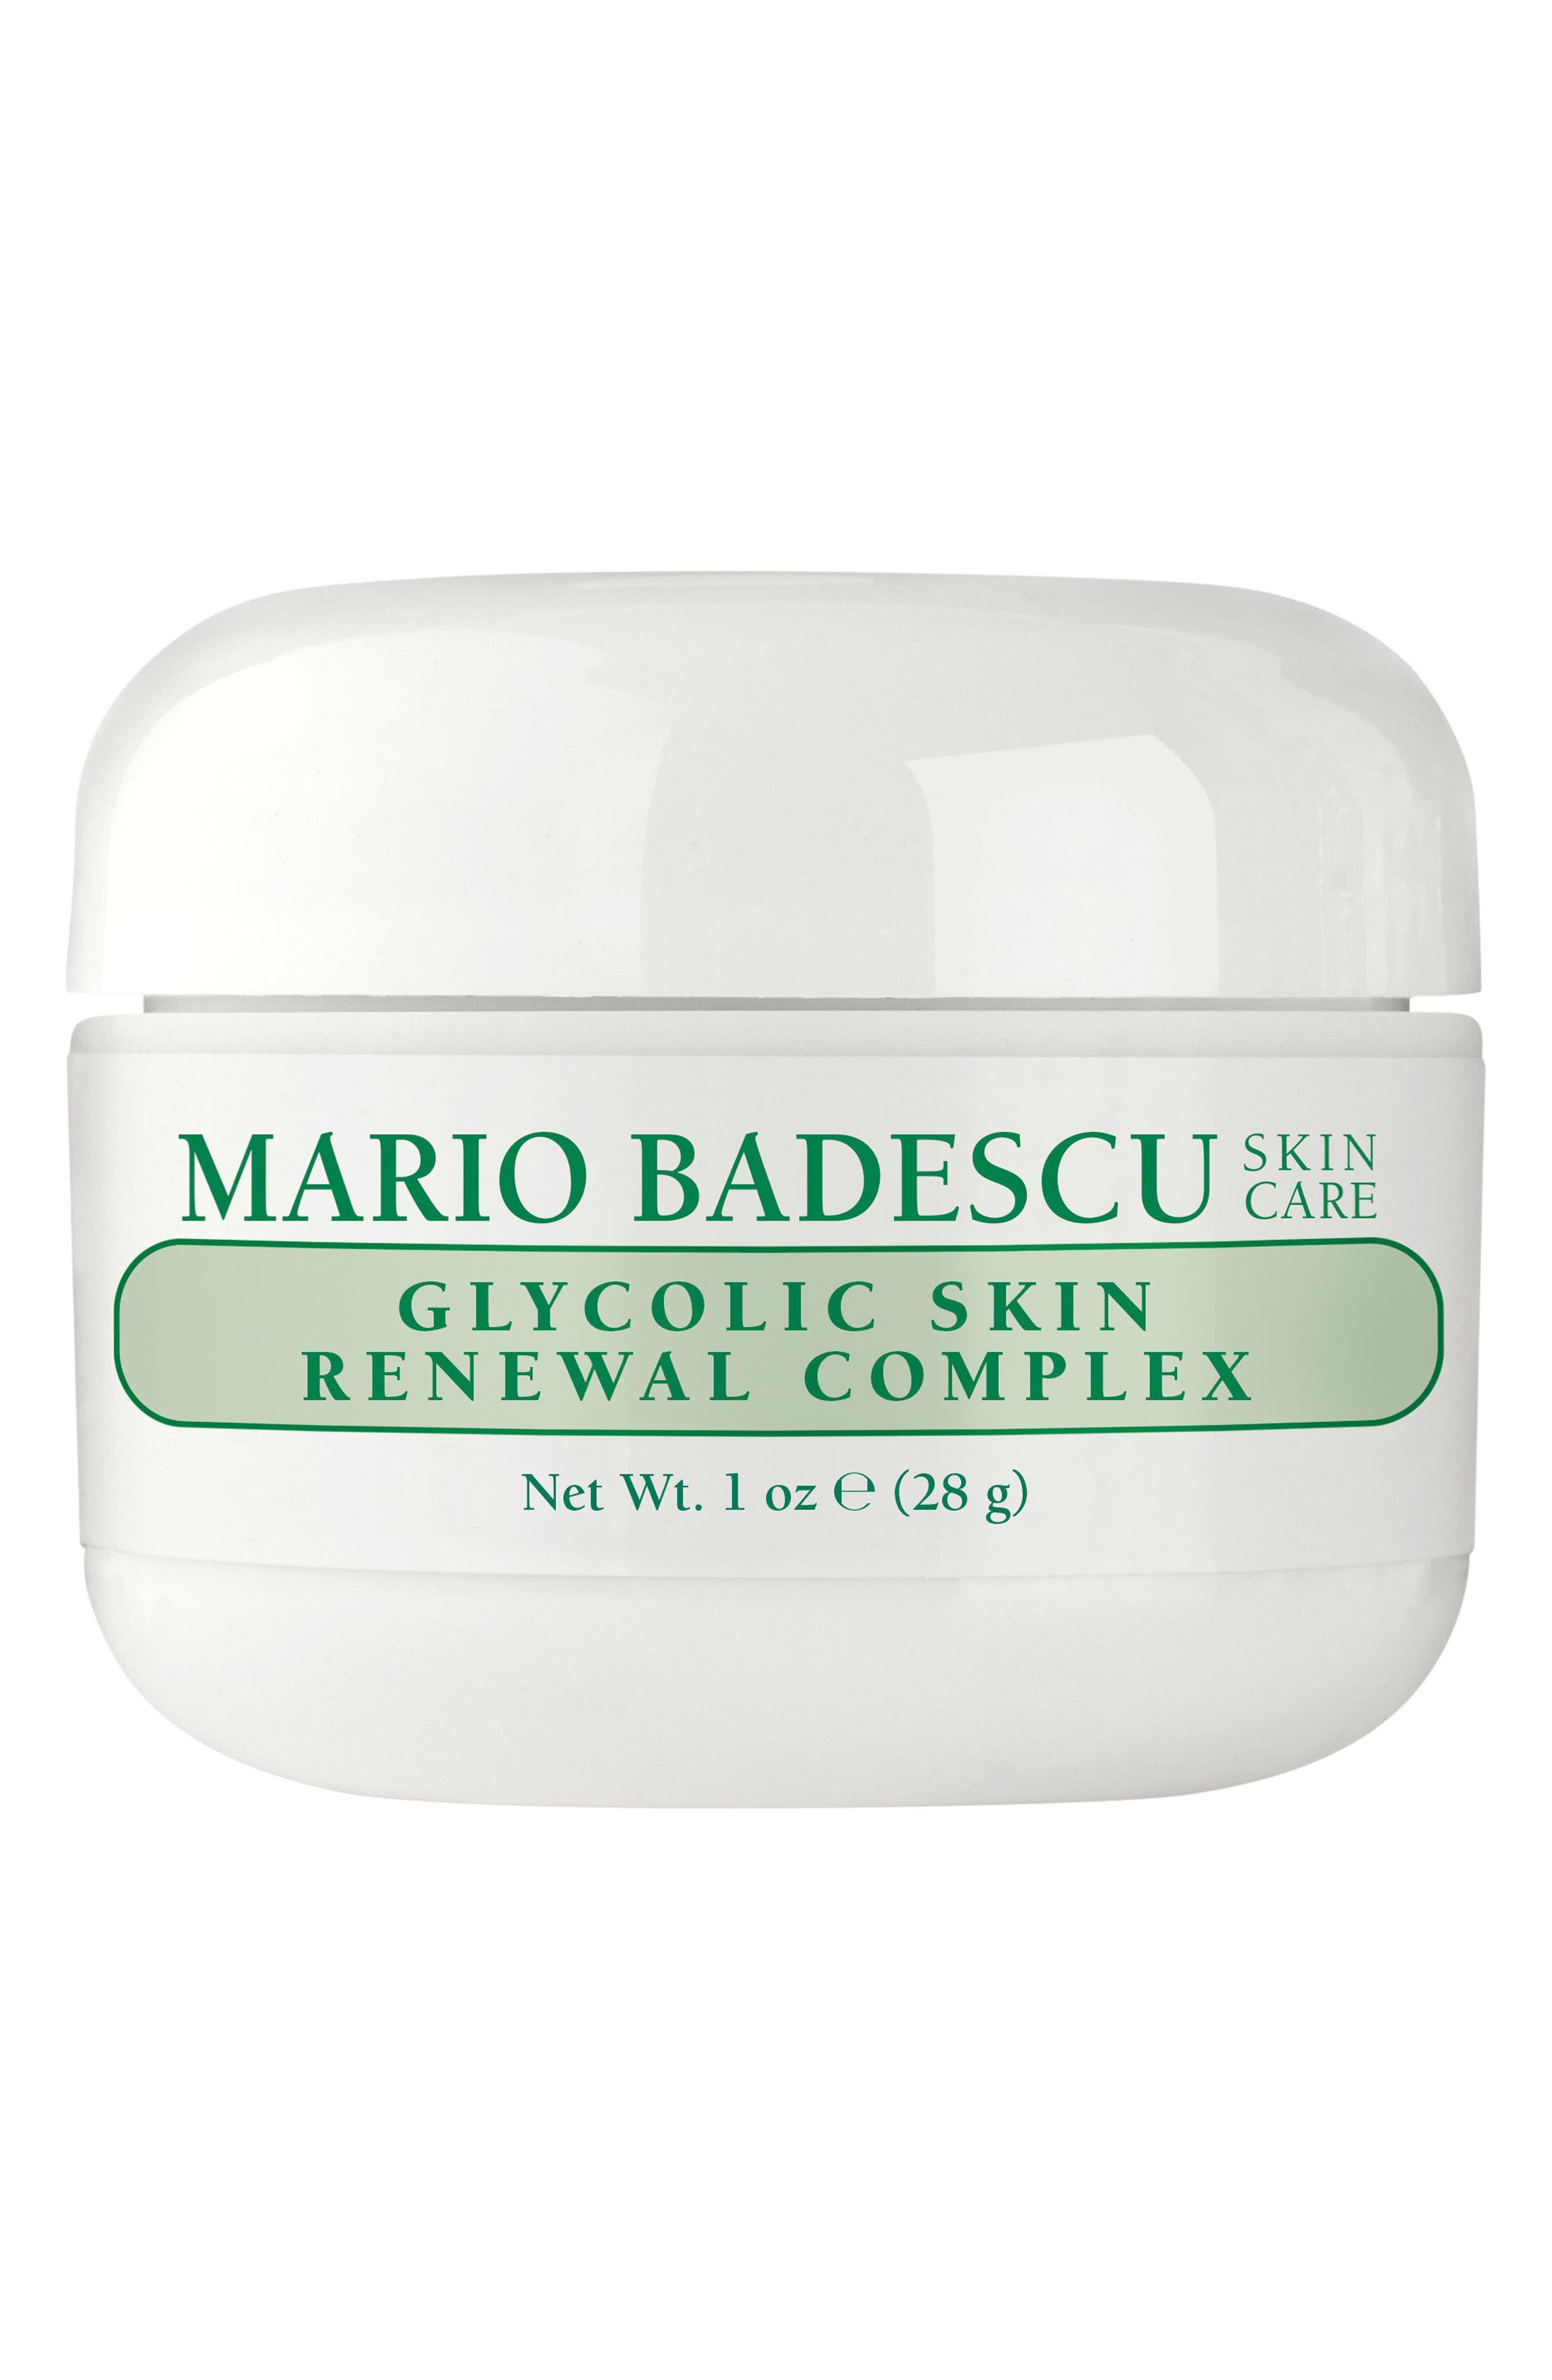 Mario Badescu Skin Care Mario Badescu  Ceramide Complex, 1 oz DermaNew Microdermabrasion Replenishing Night Creme 1.5oz